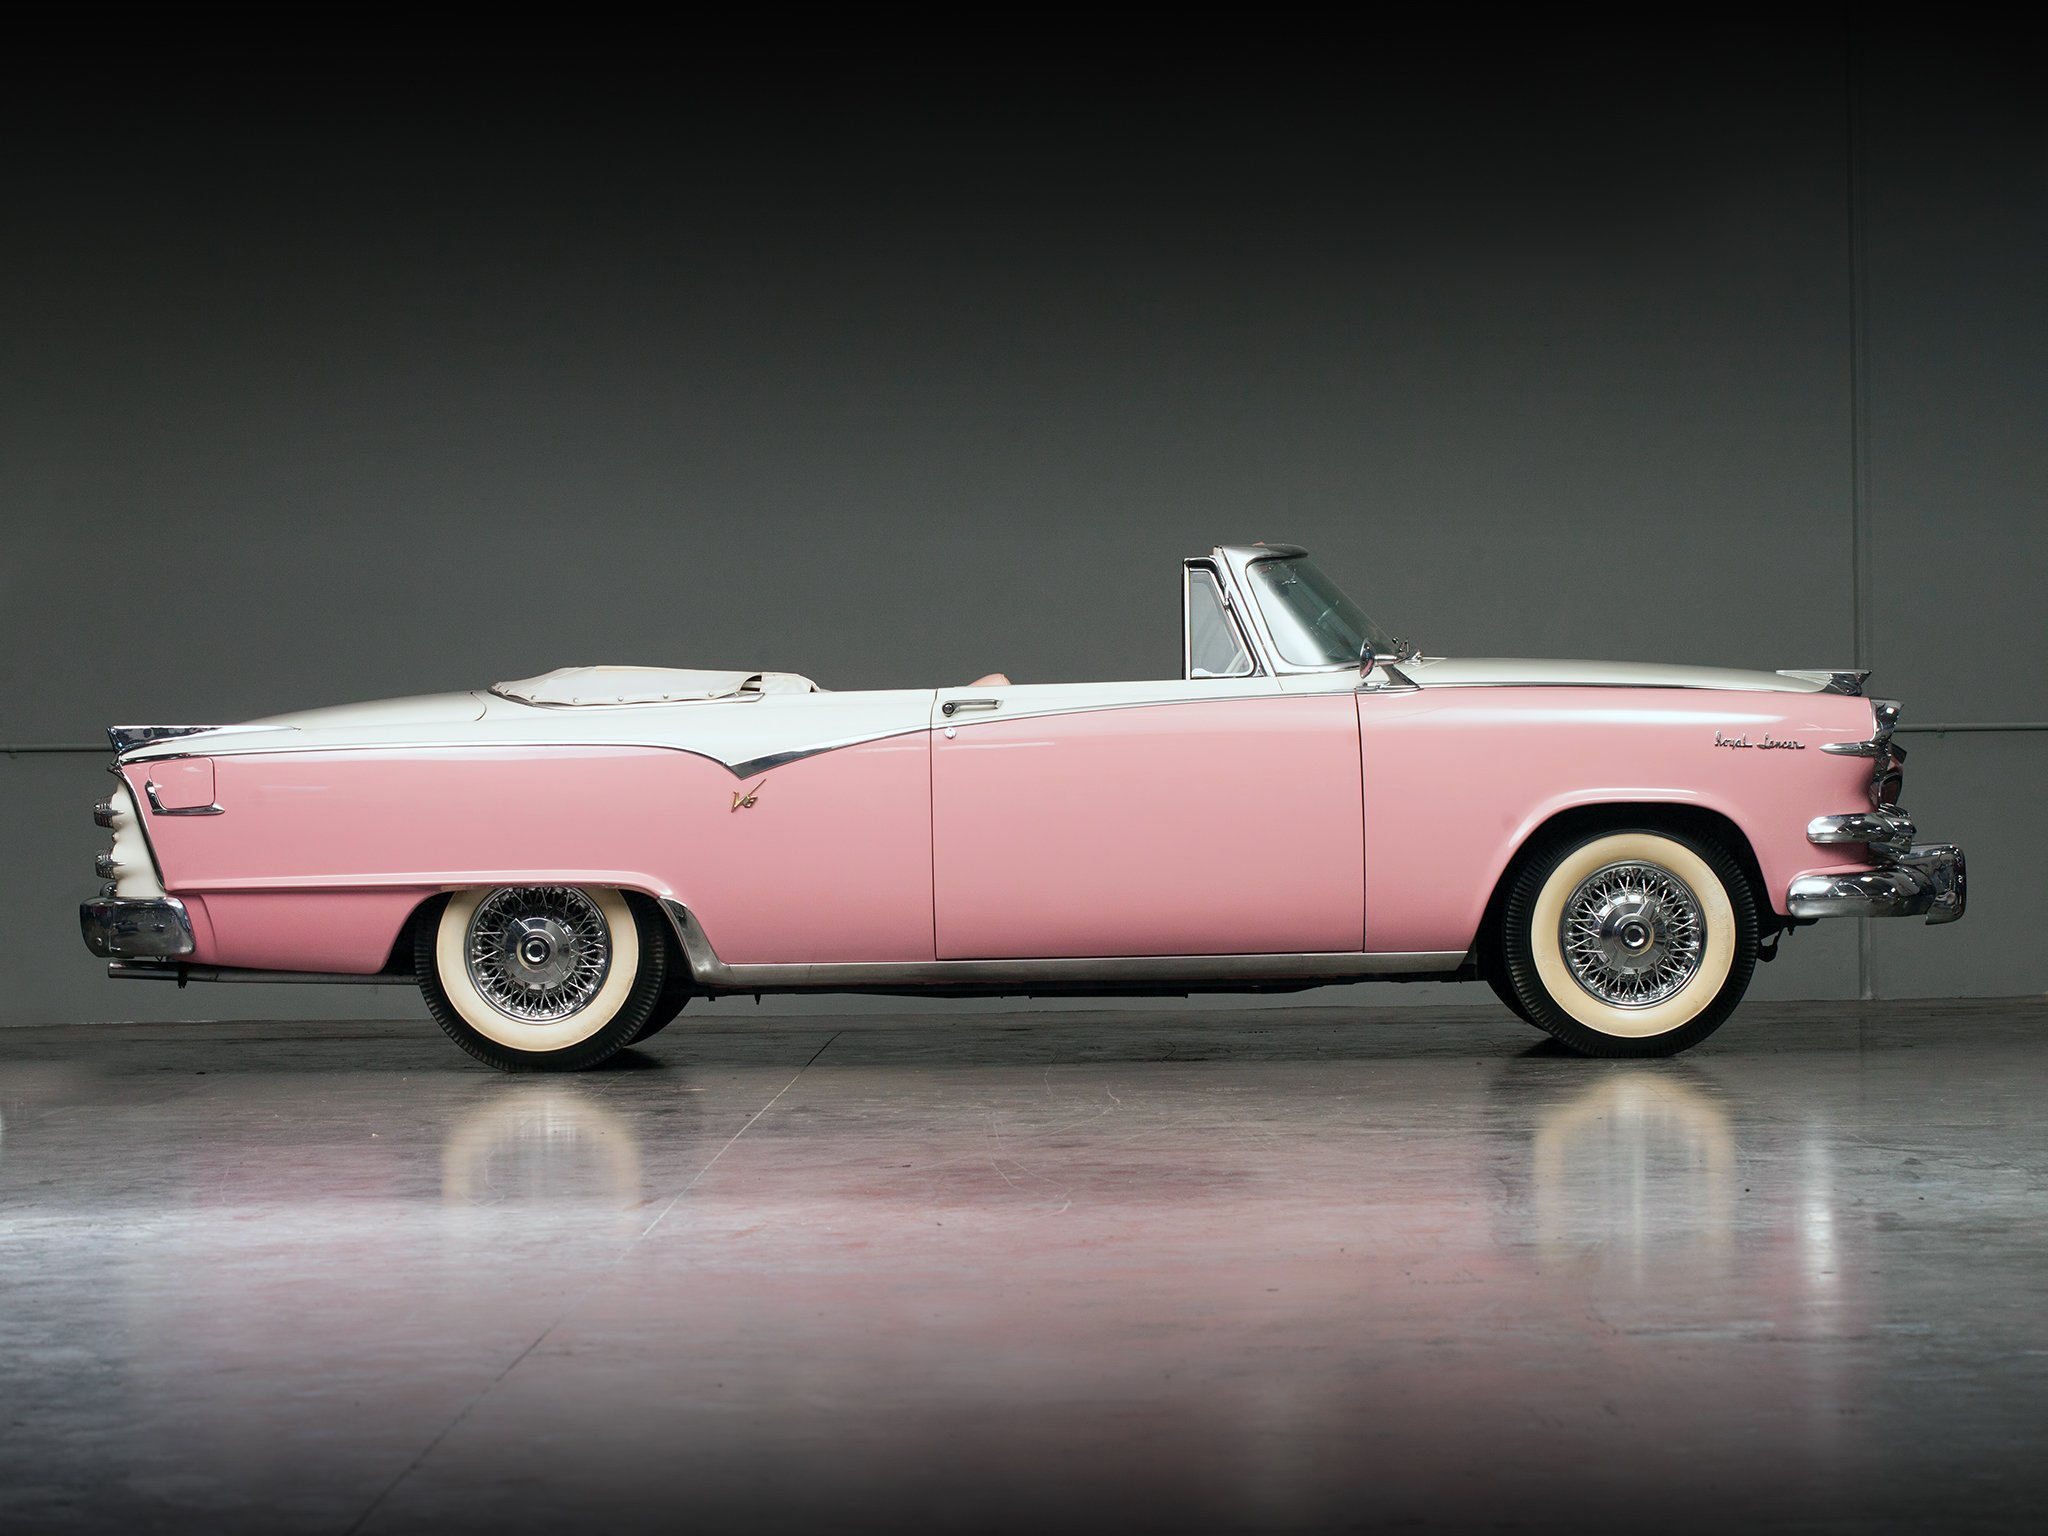 1955 dodge royal lancer convertible cream black fvr cars - Filename 26d3f1054671019fbe55587bf1f99164 Jpg